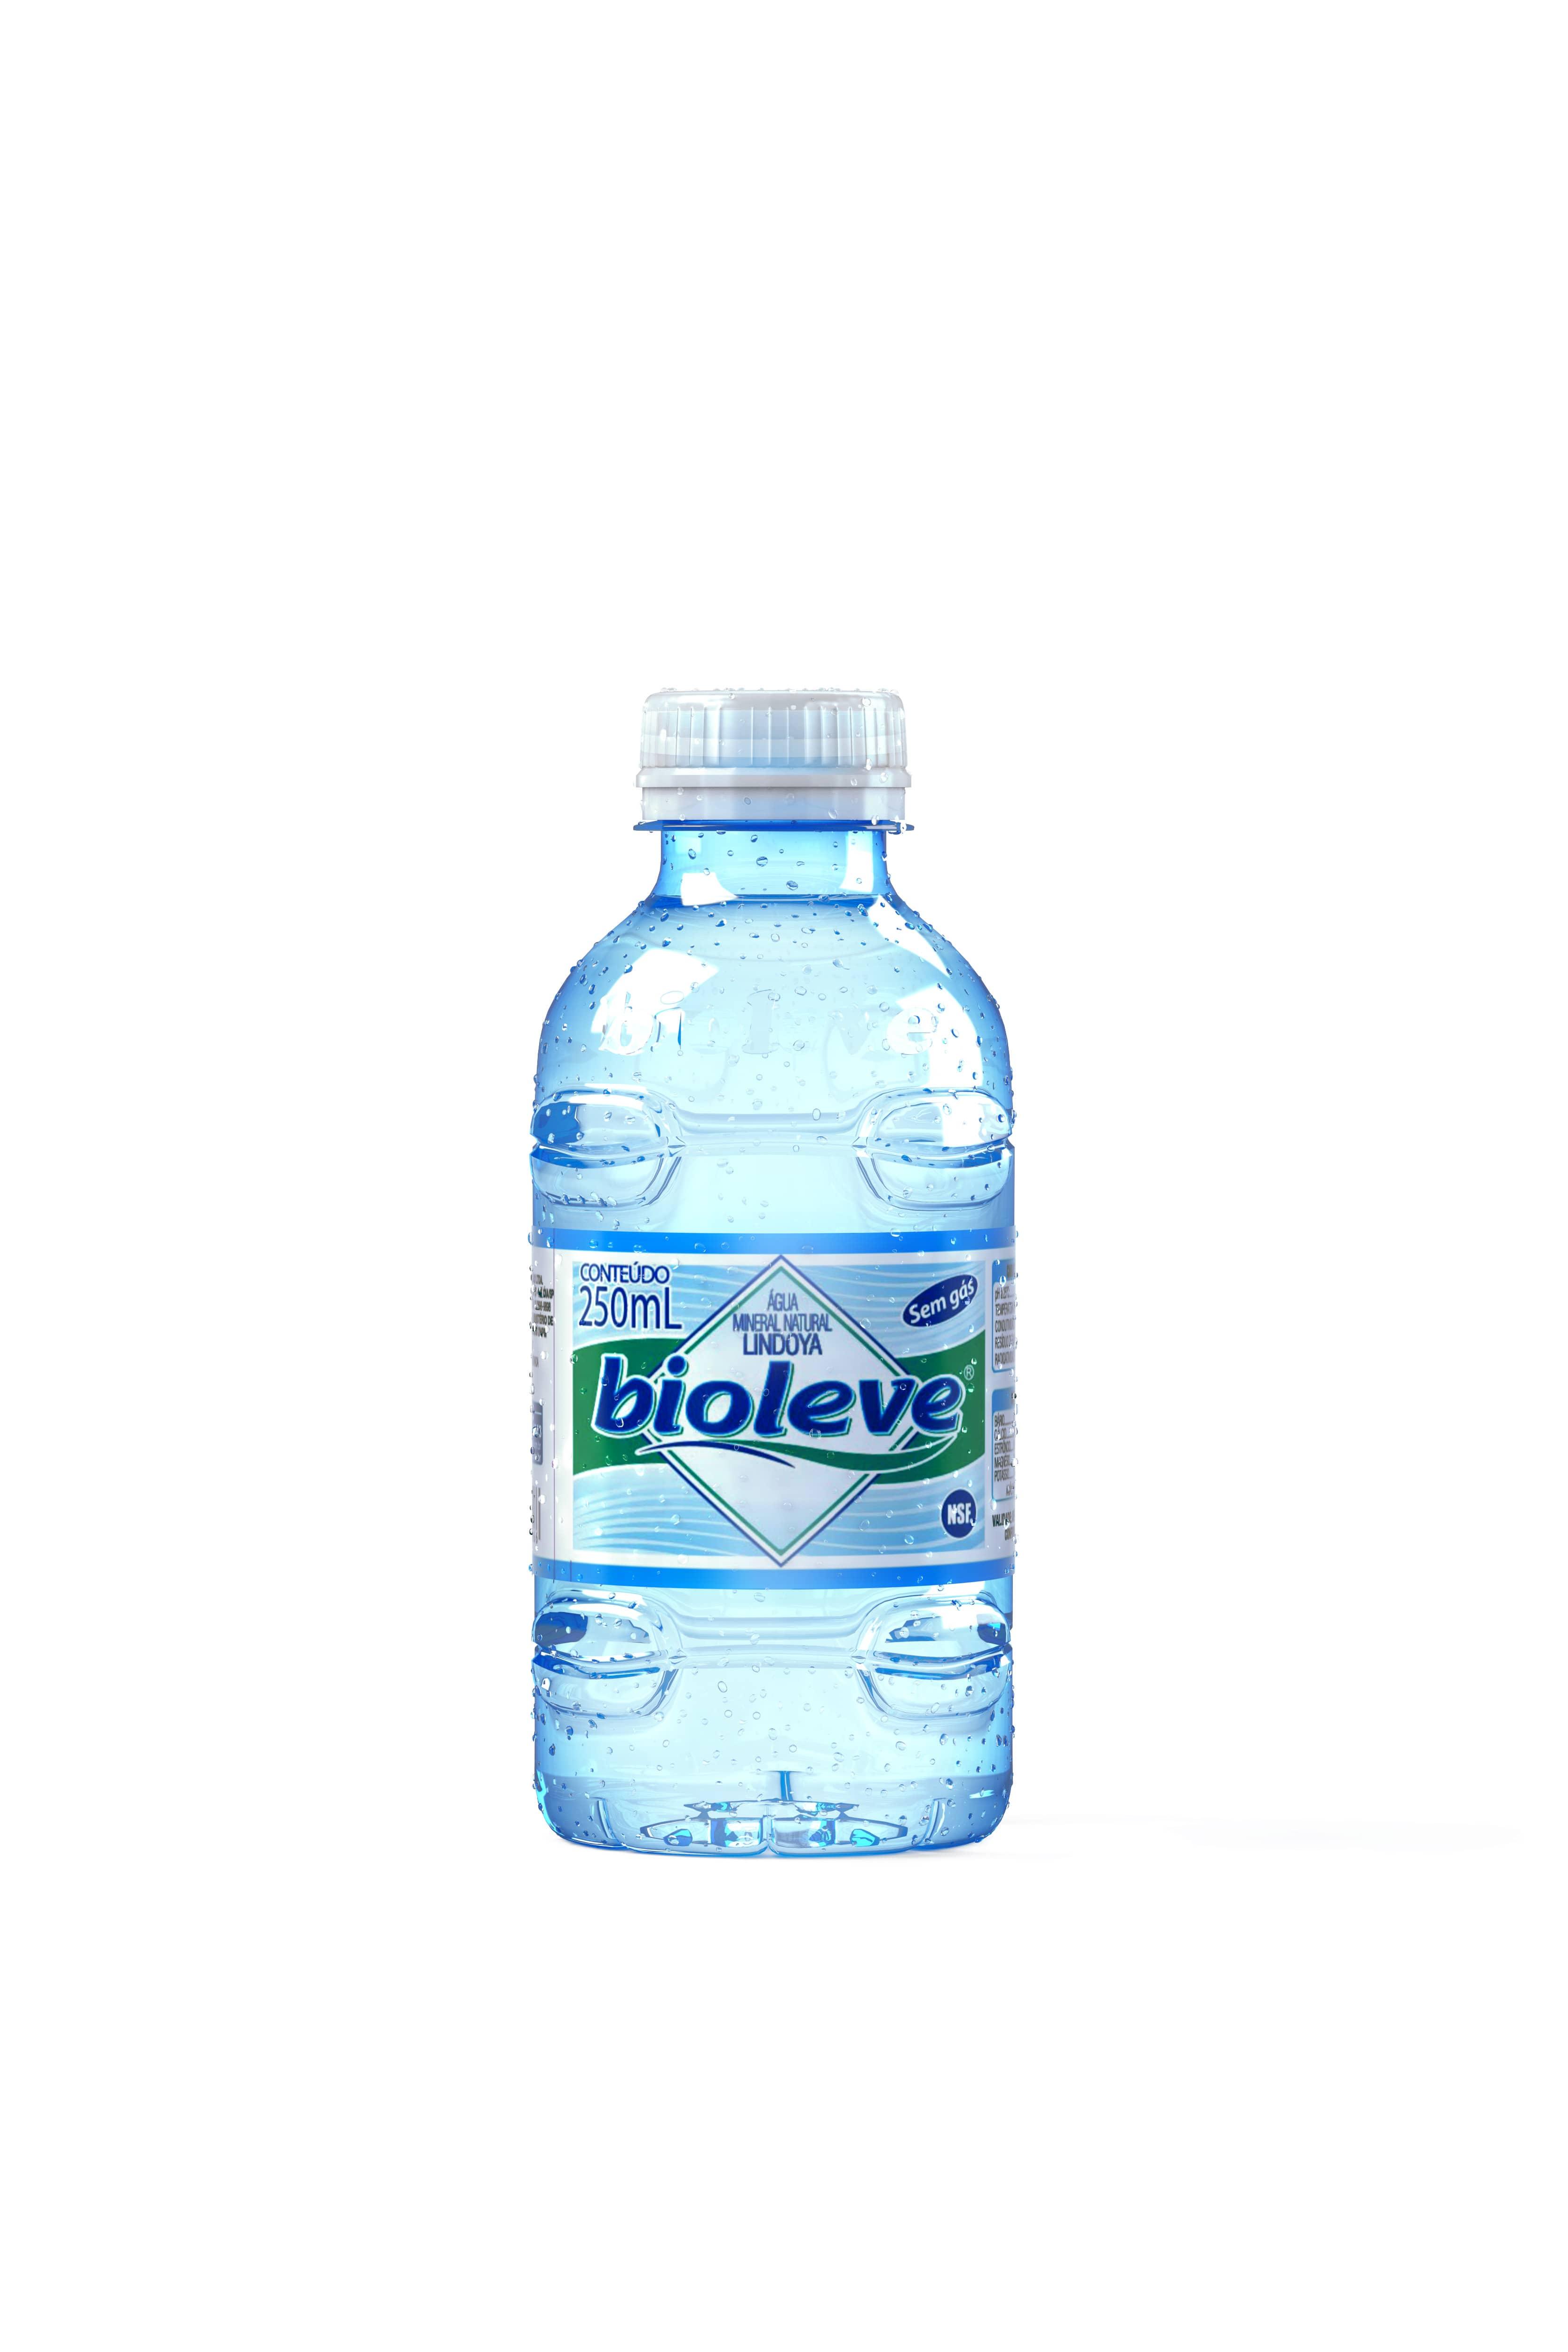 Bioleve-Agua-250ml-SG-2